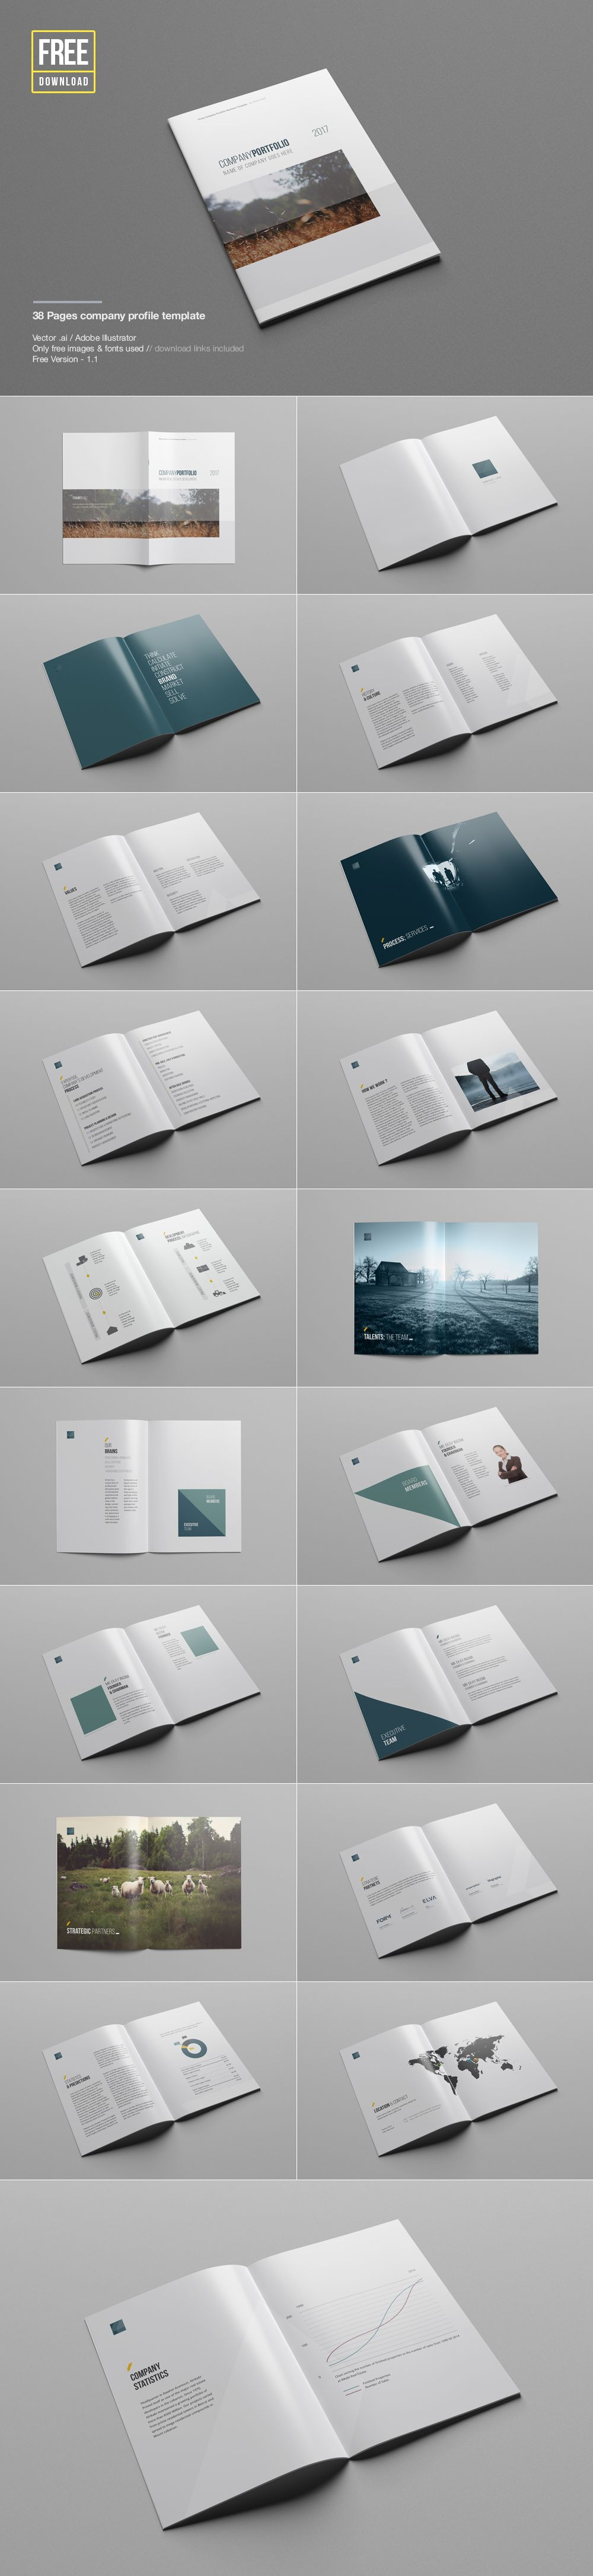 Free Download Company Profile Template Brochure Magazine – Write Company Profile Template